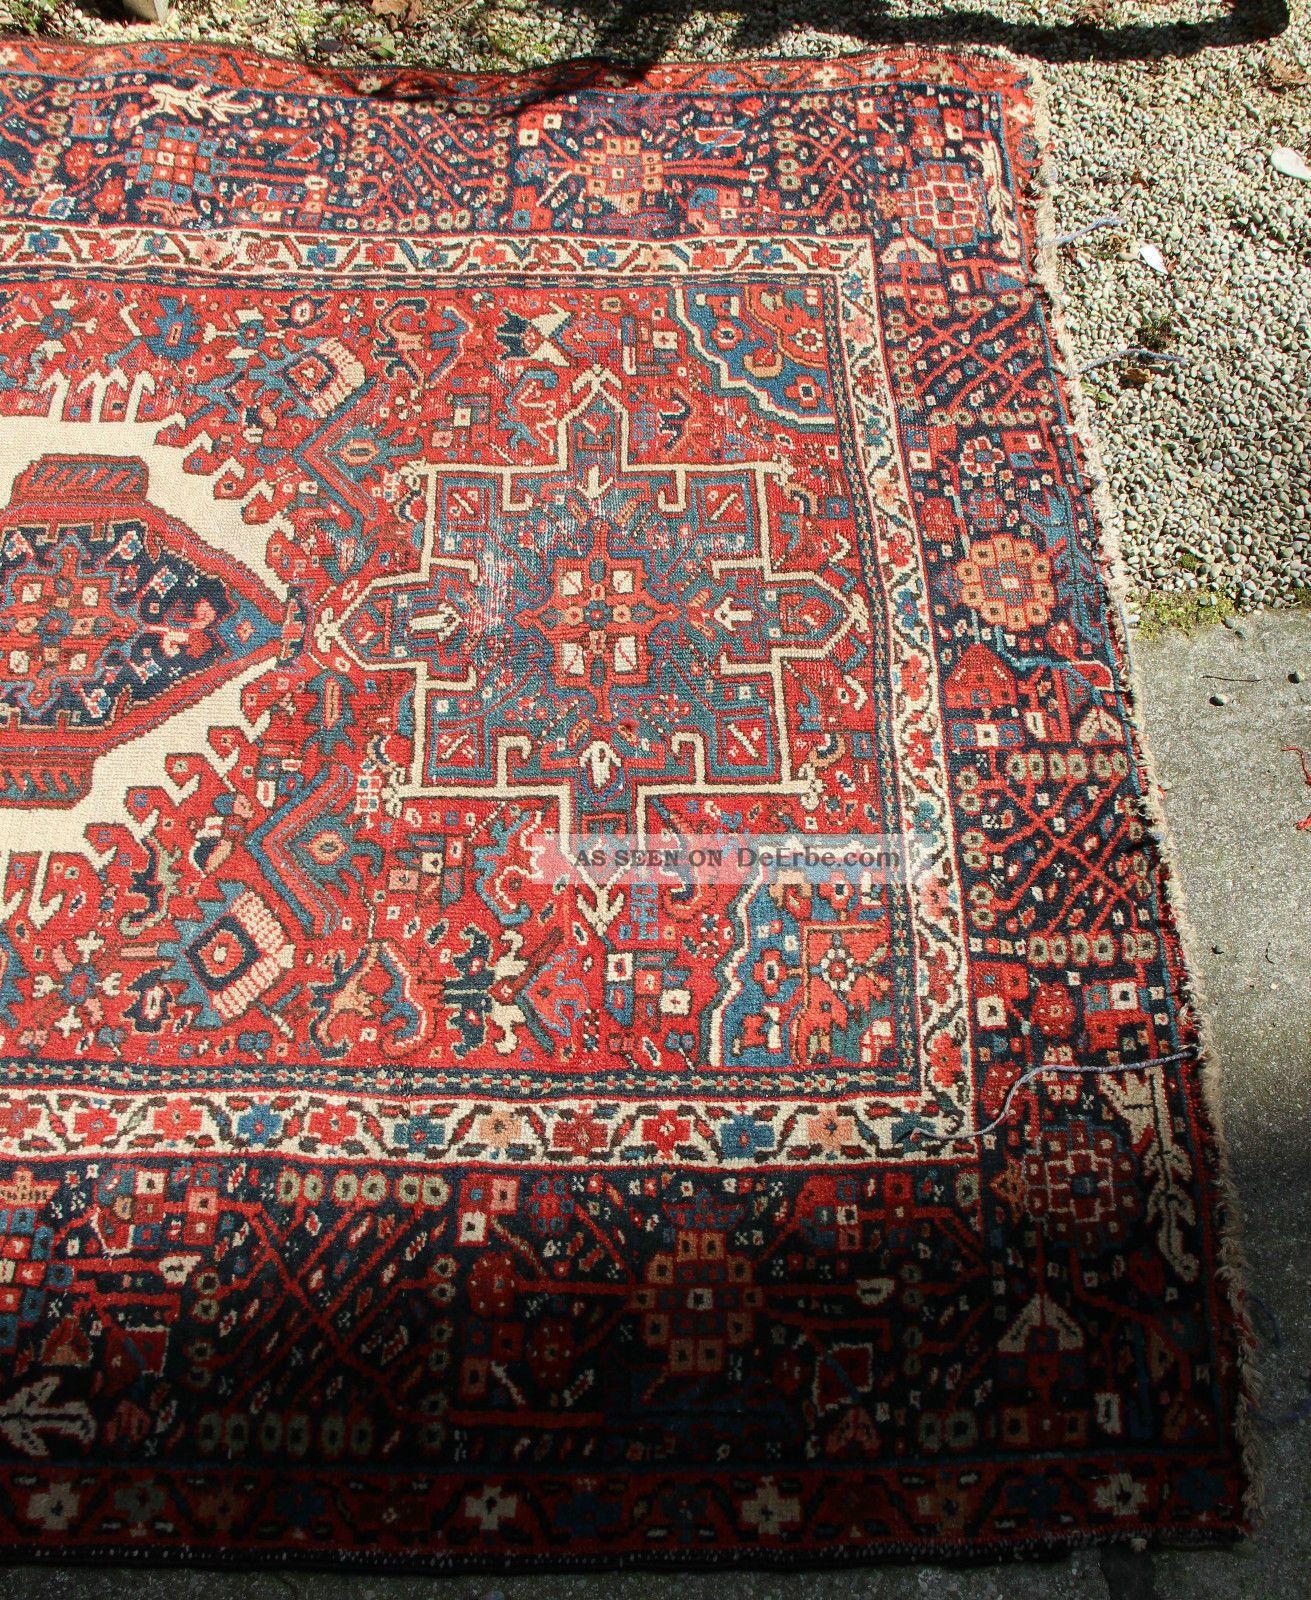 antiker persischer gashgai teppich l ufer um 1880 antique carpet 145 x 185cm. Black Bedroom Furniture Sets. Home Design Ideas